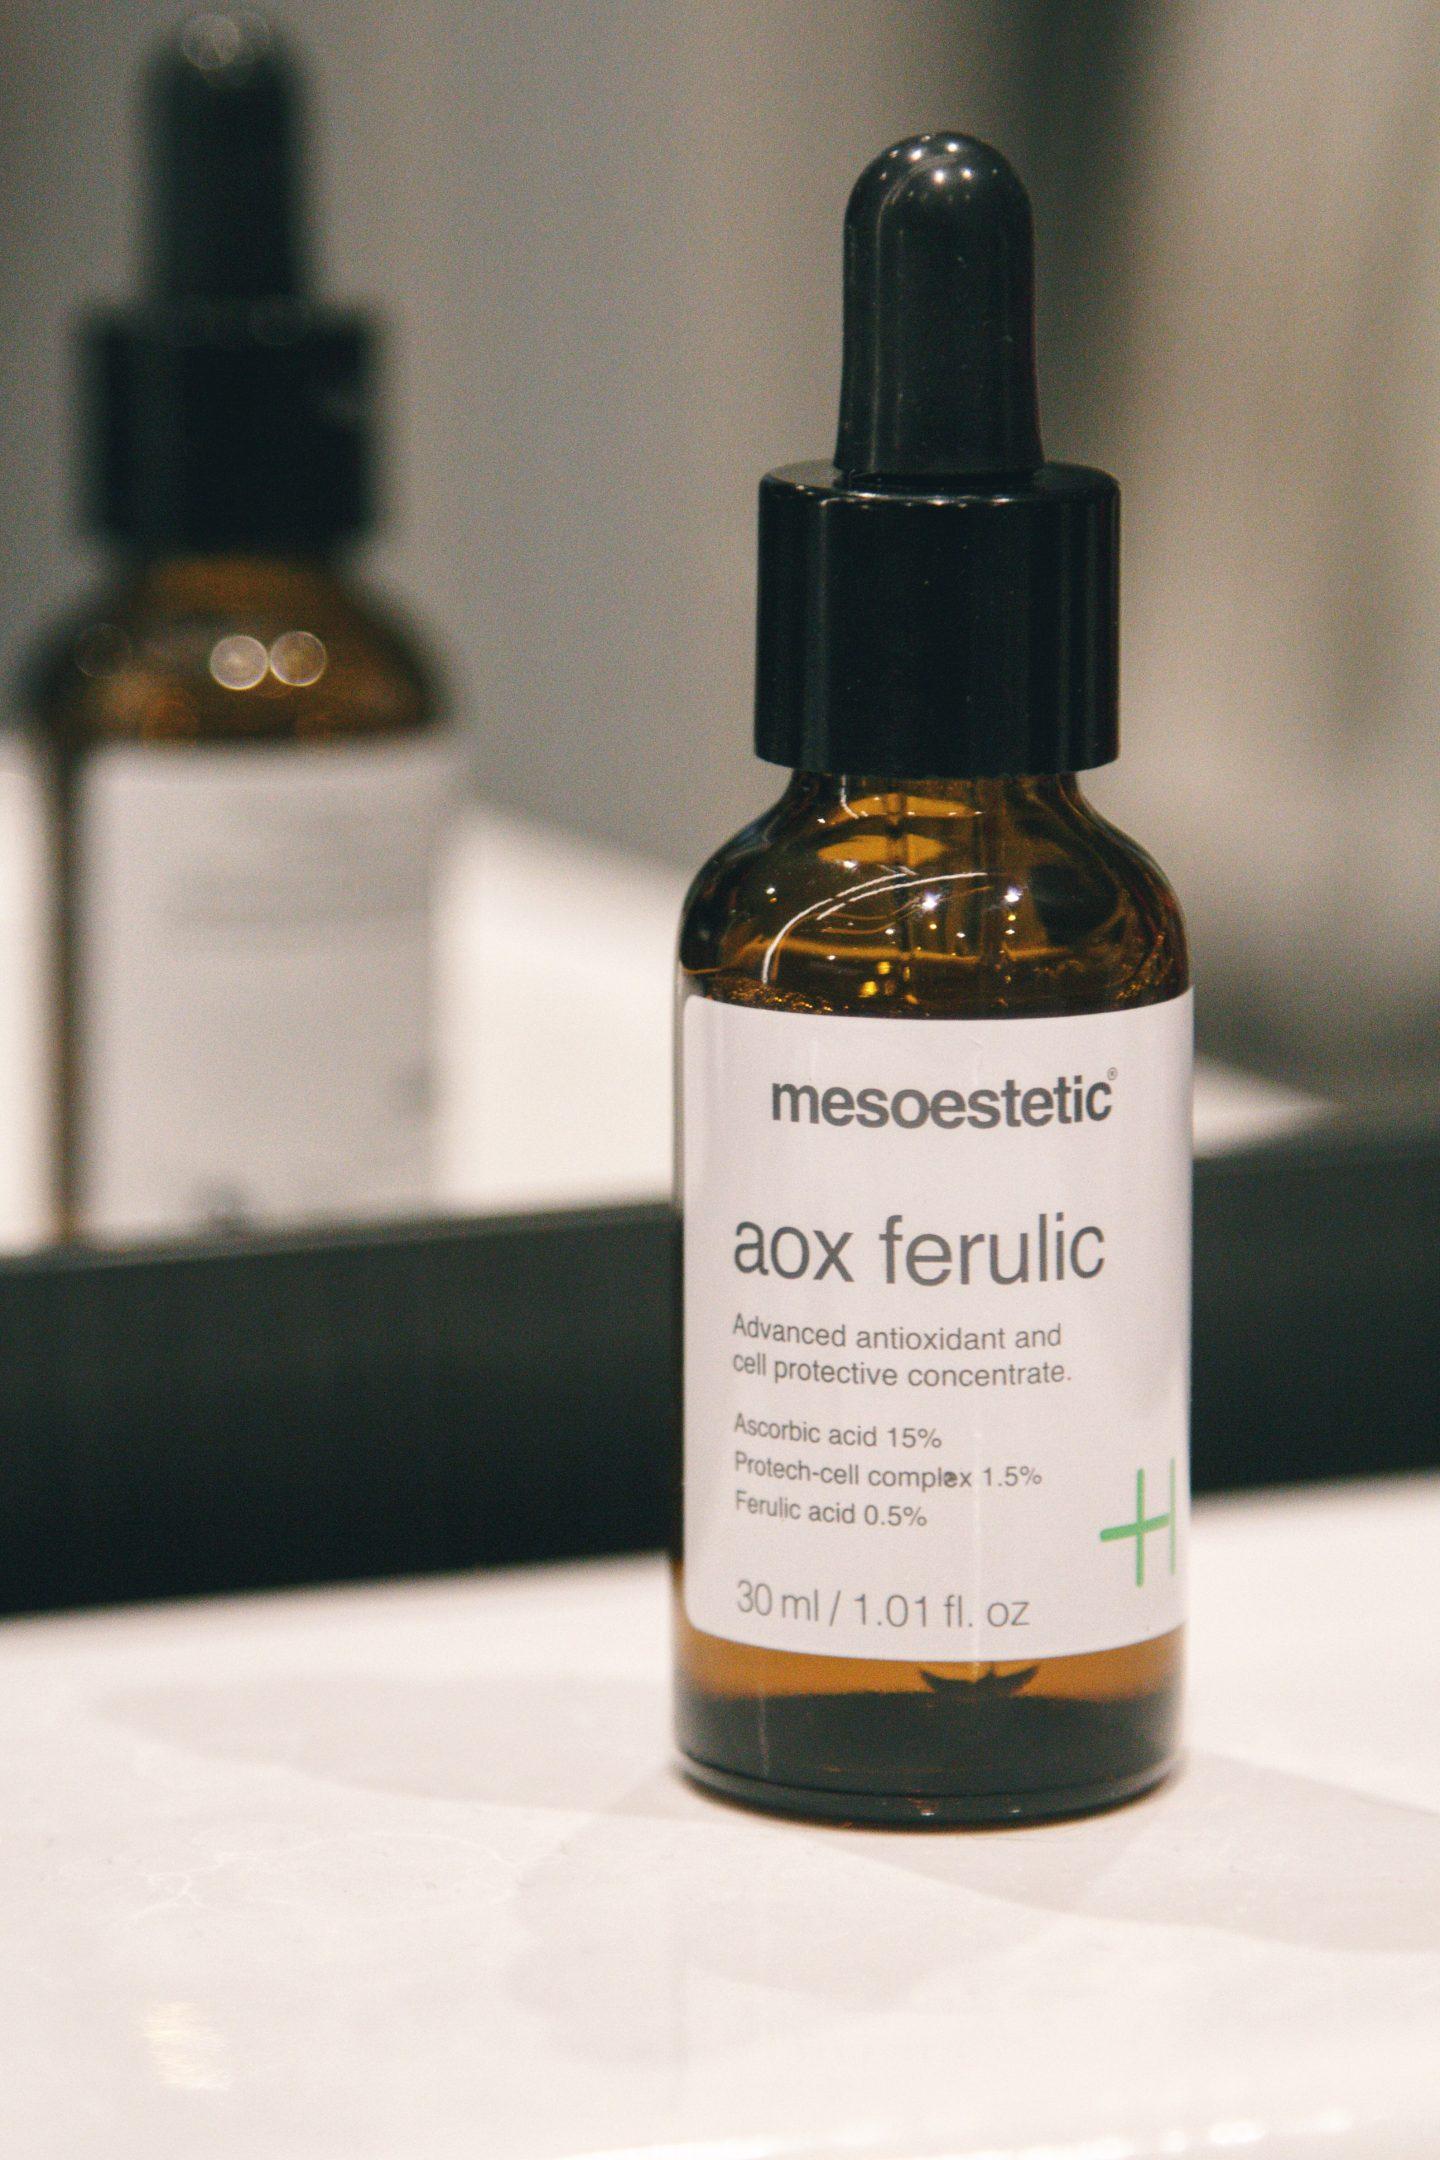 Mesoestetic AOX Ferulic Serum